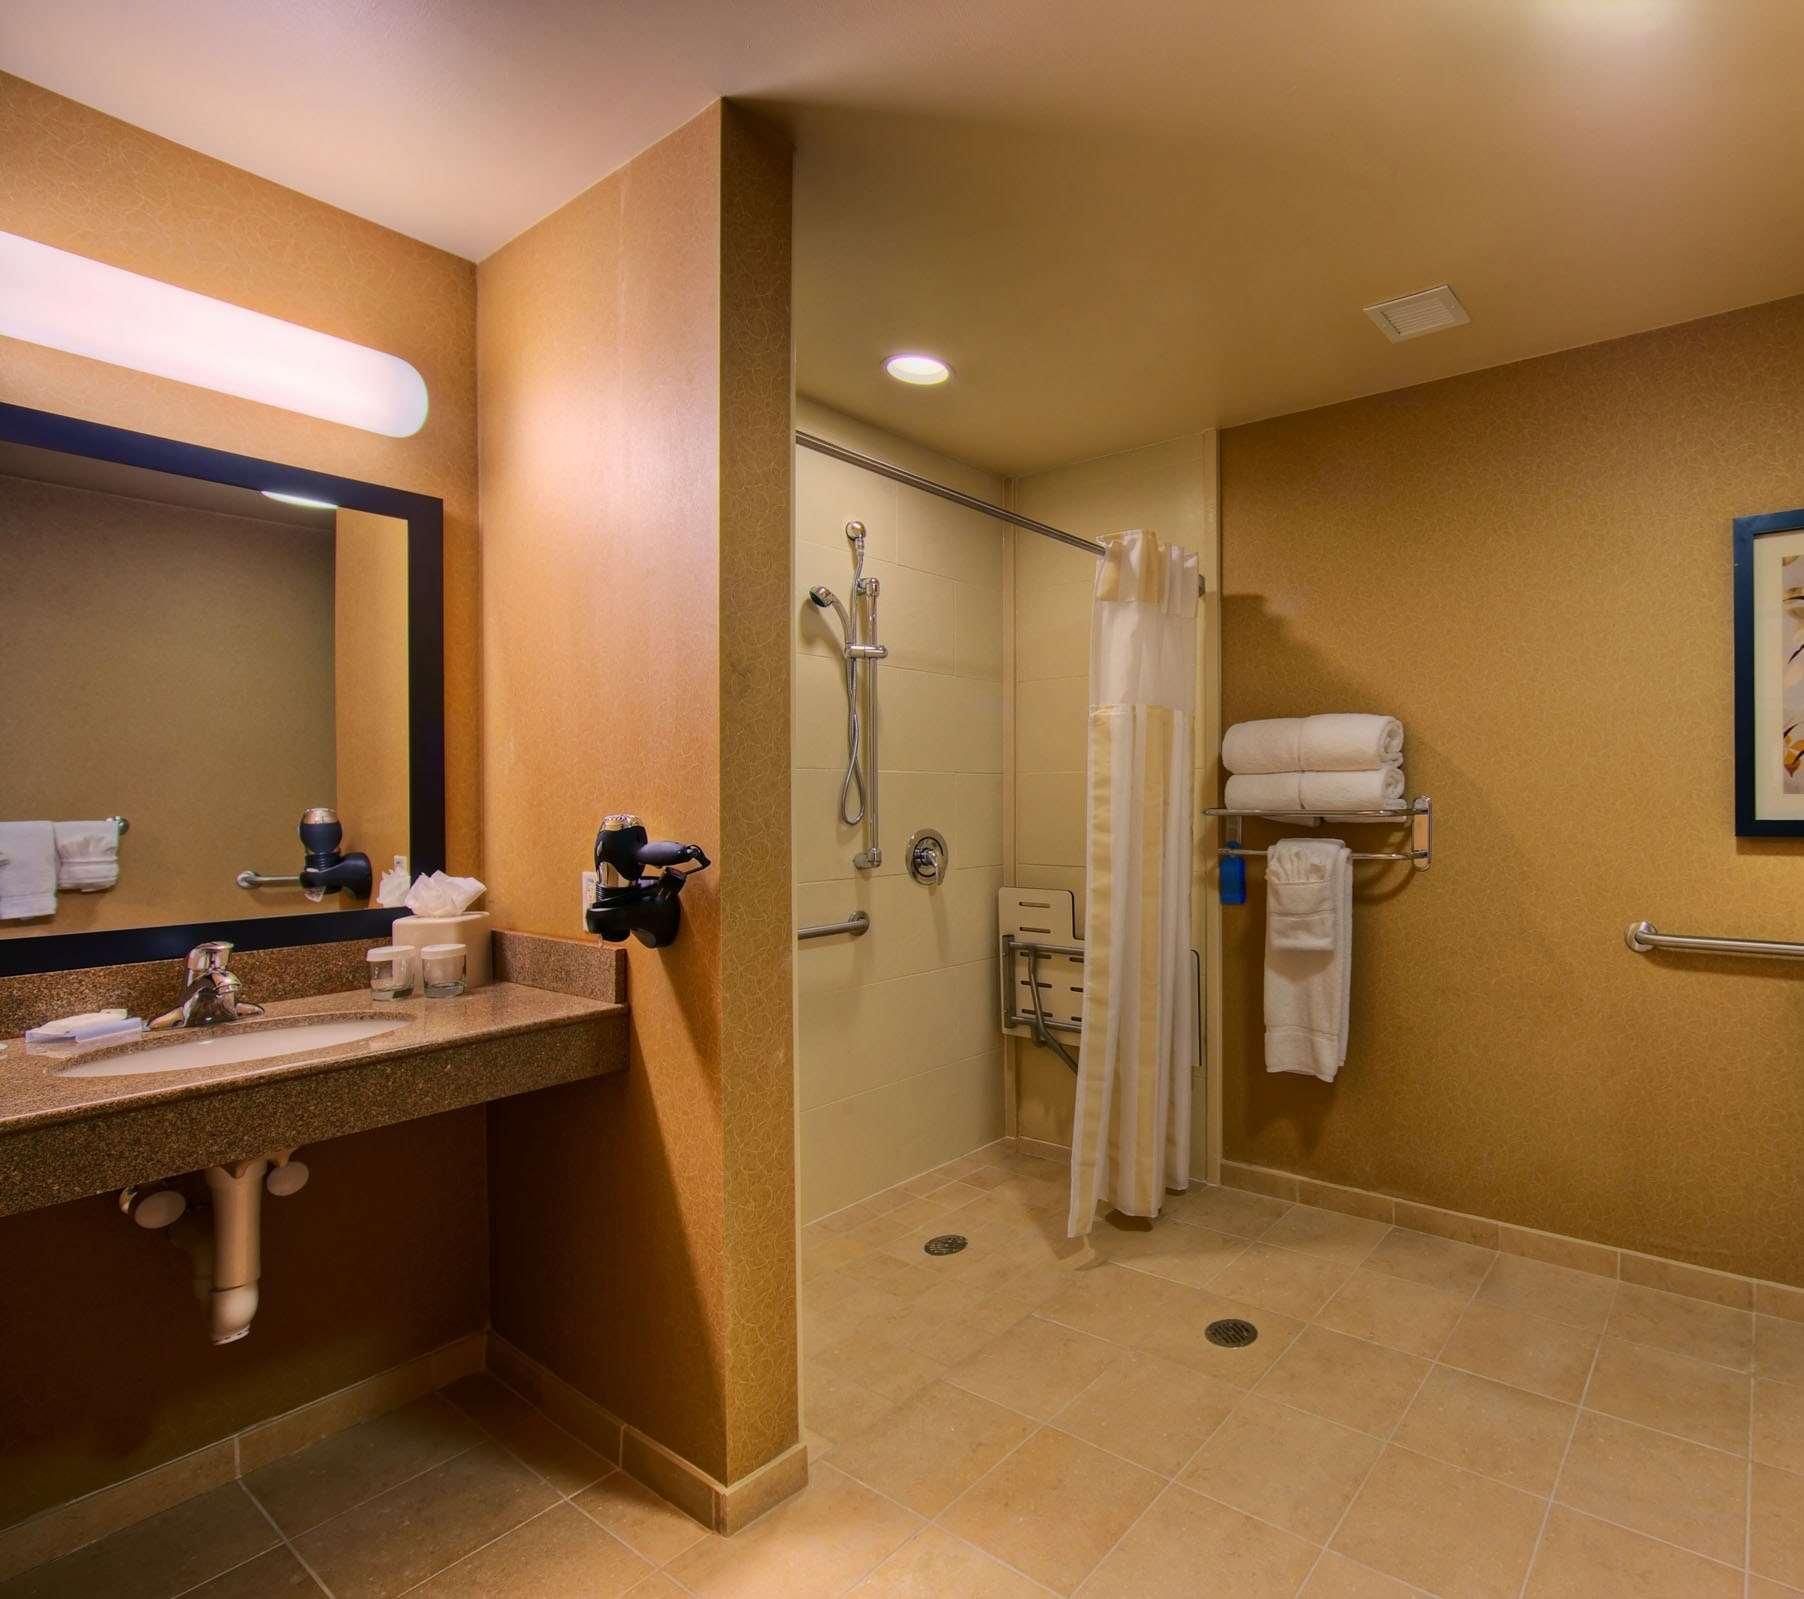 Hilton Garden Inn DFW North Grapevine image 30